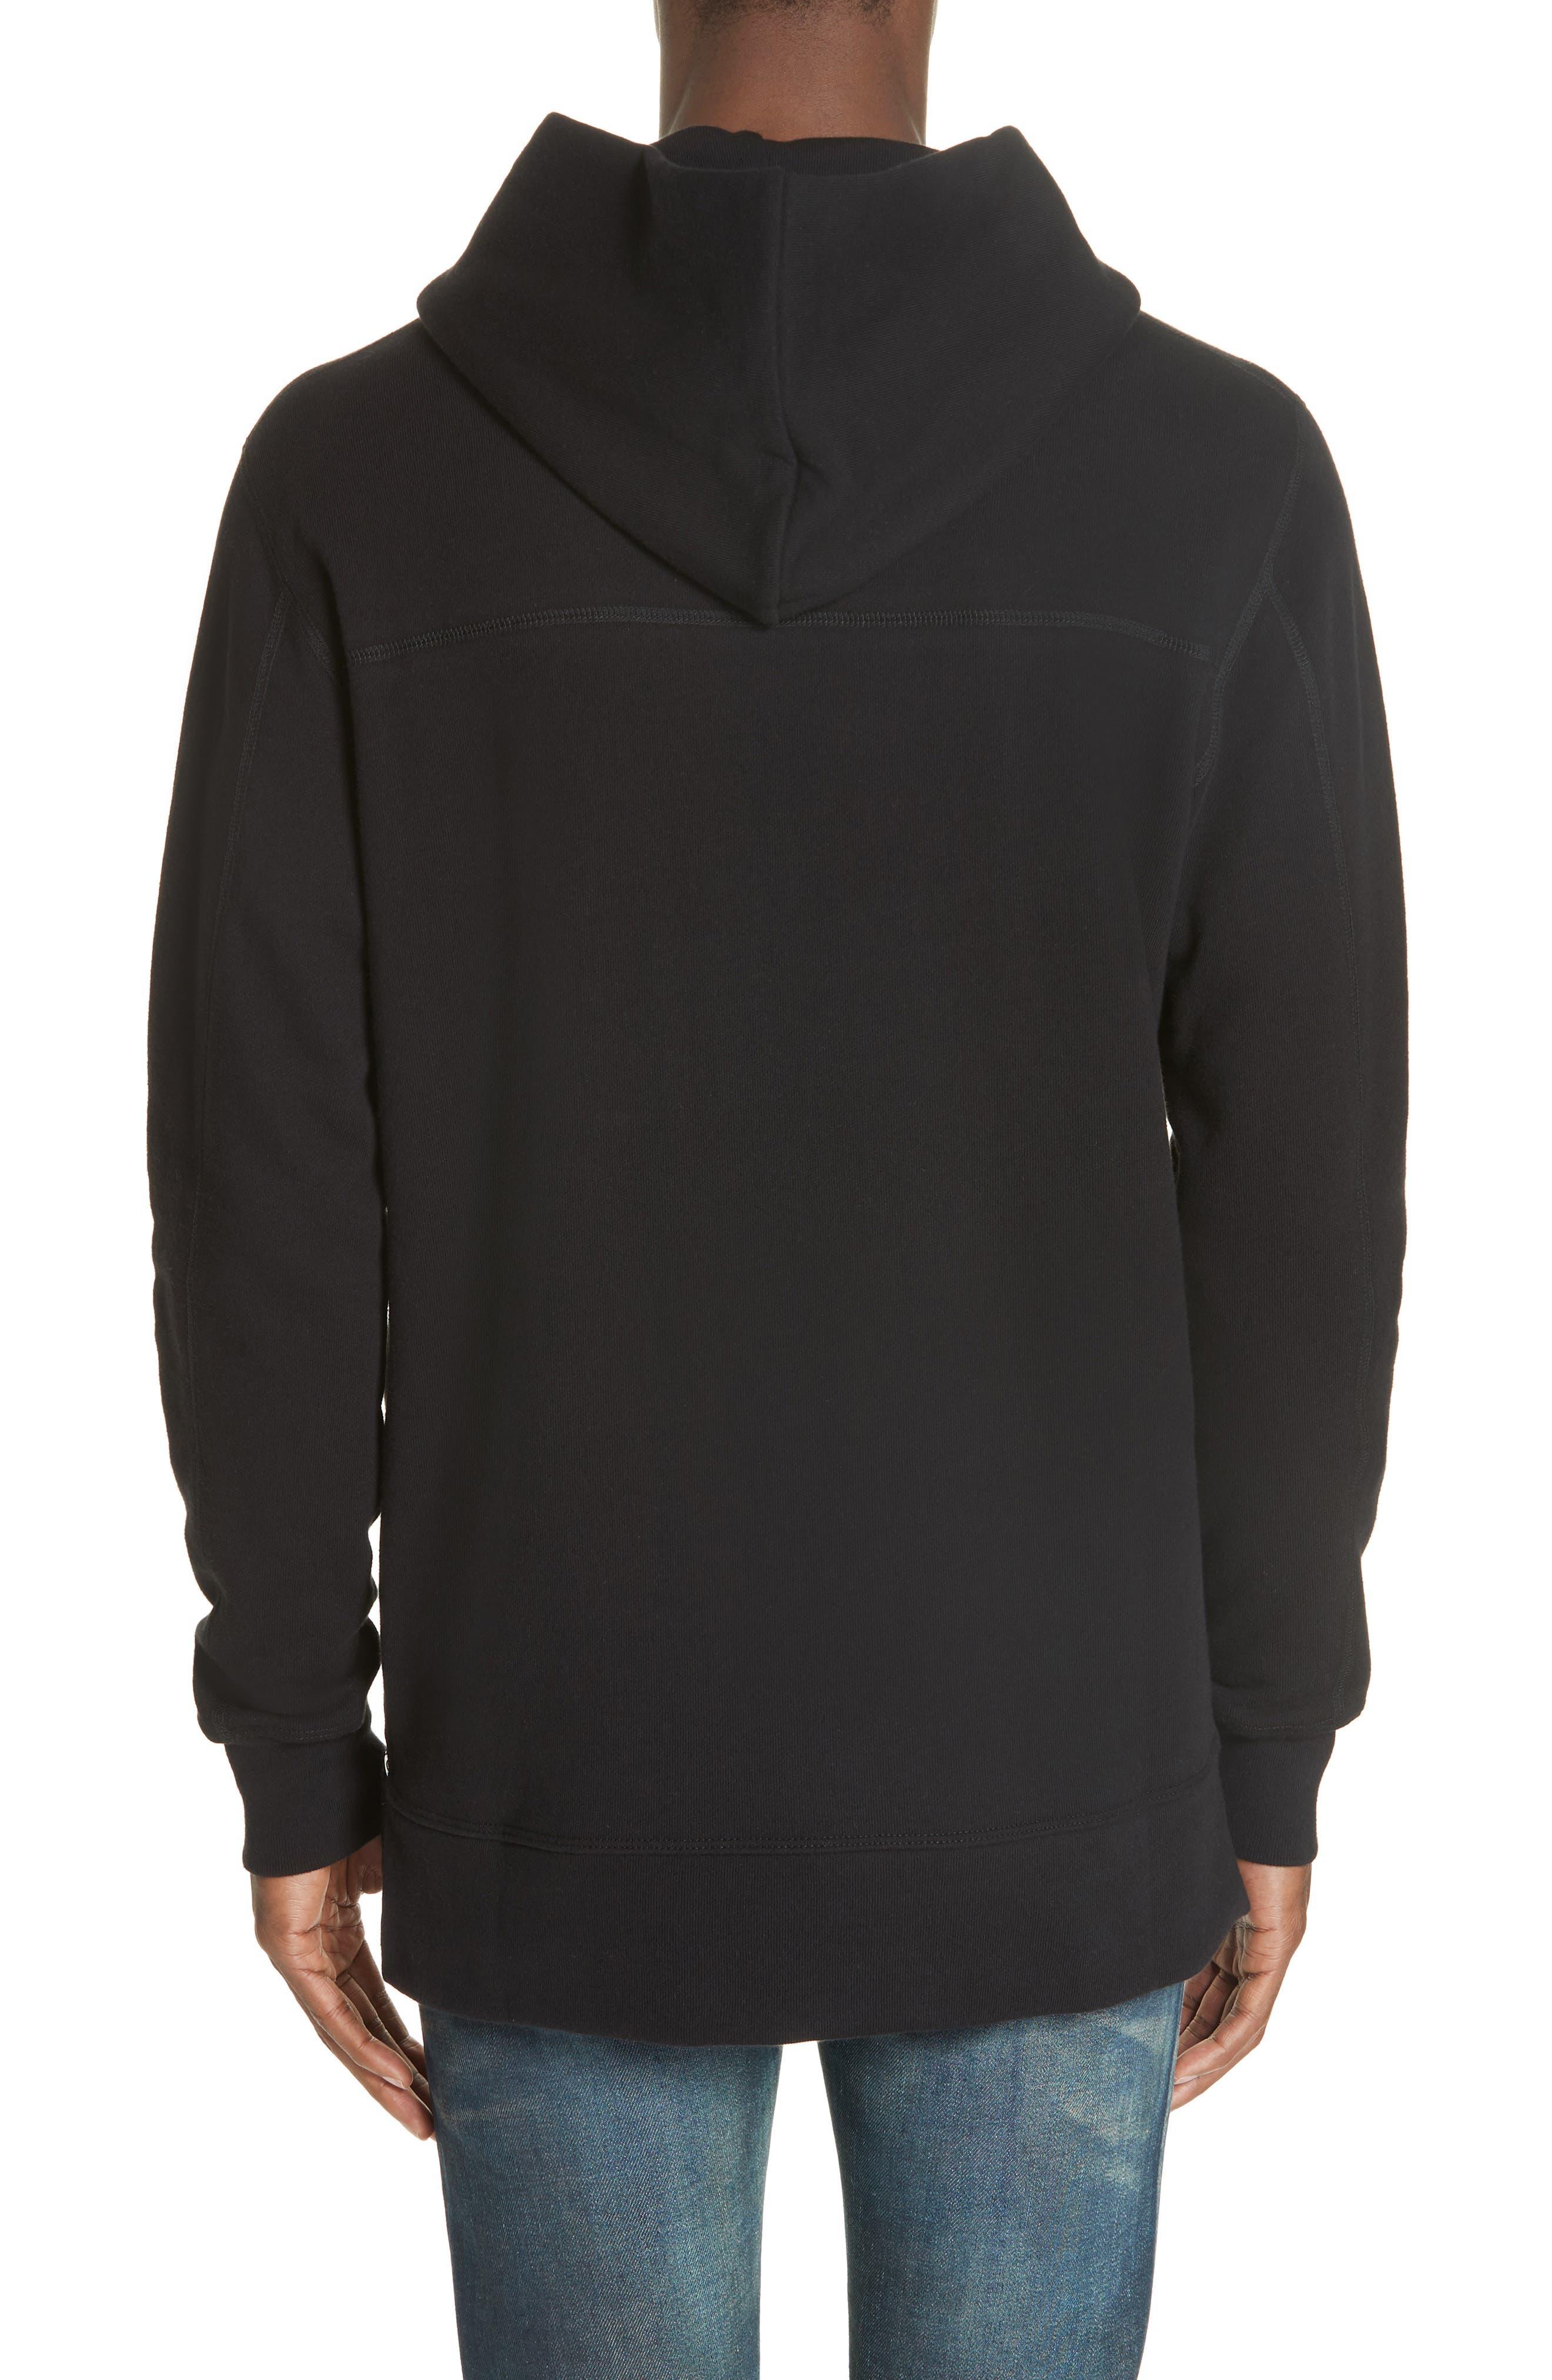 JOHN ELLIOTT, Hooded Villain Sweatshirt, Alternate thumbnail 2, color, BLACK